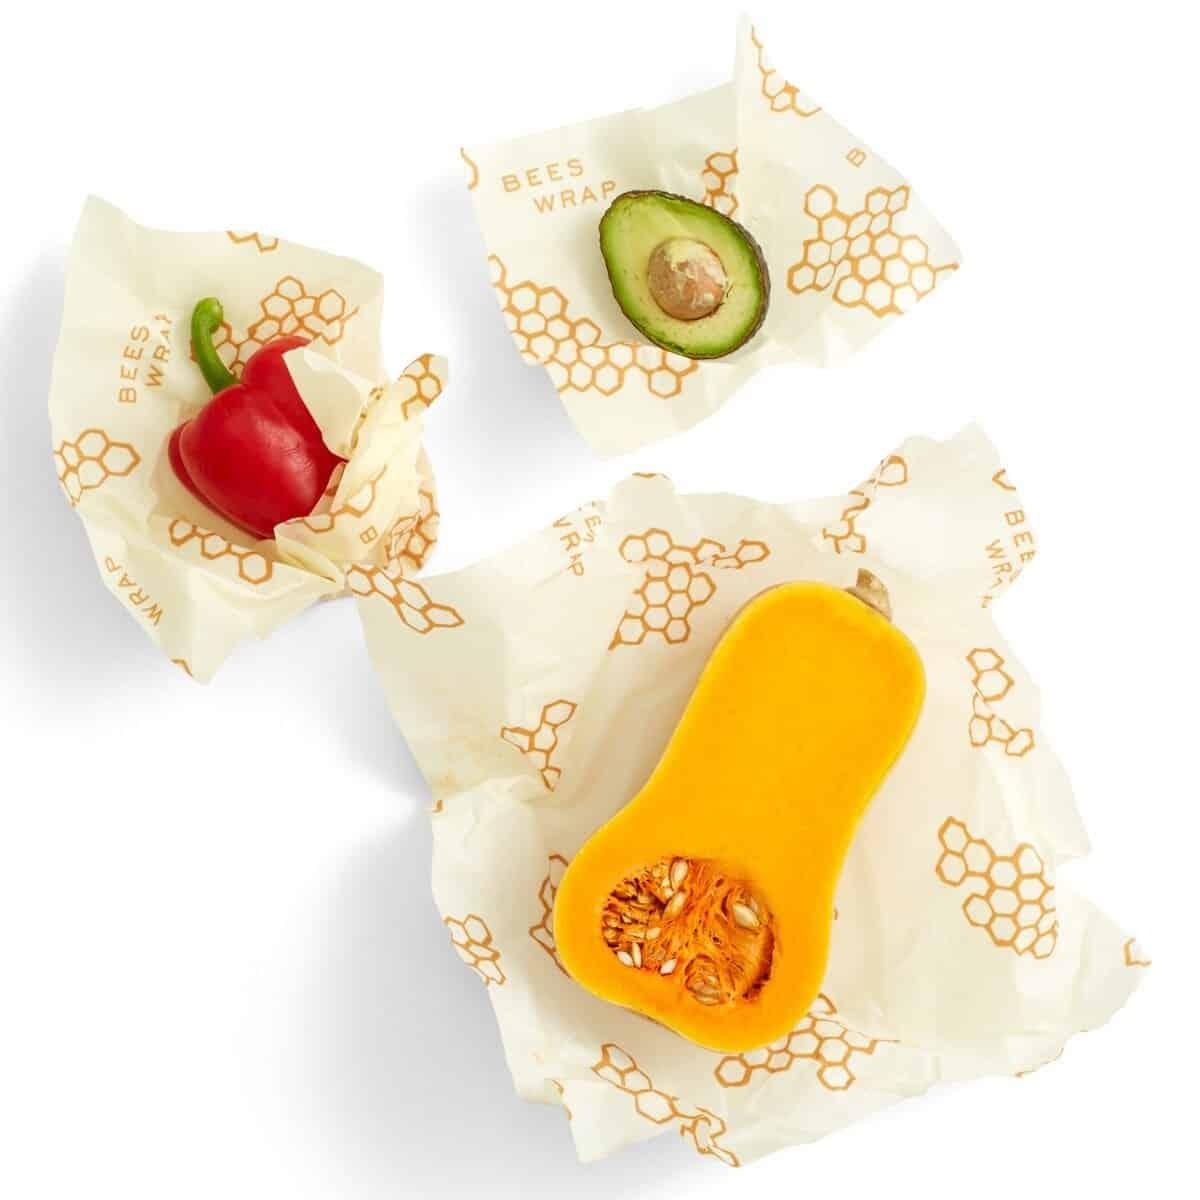 Bee's Wrap Food Wraps | Eco Friendly & Reusable